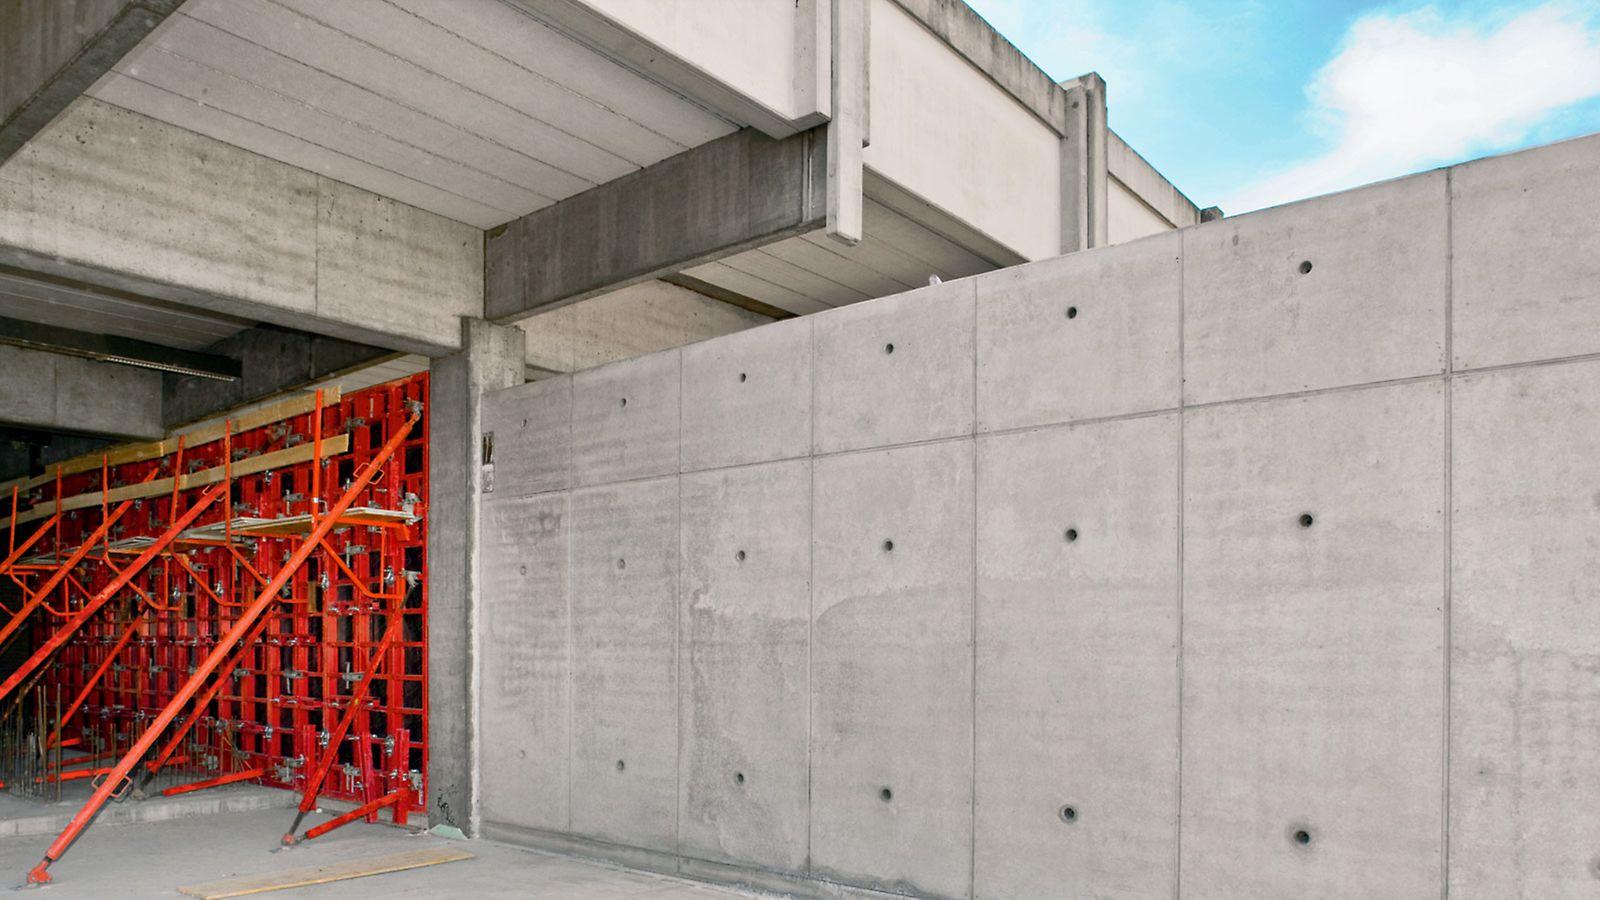 Forbedret beton finish, pænt aftryk fra samlinger og ankerpunkter.